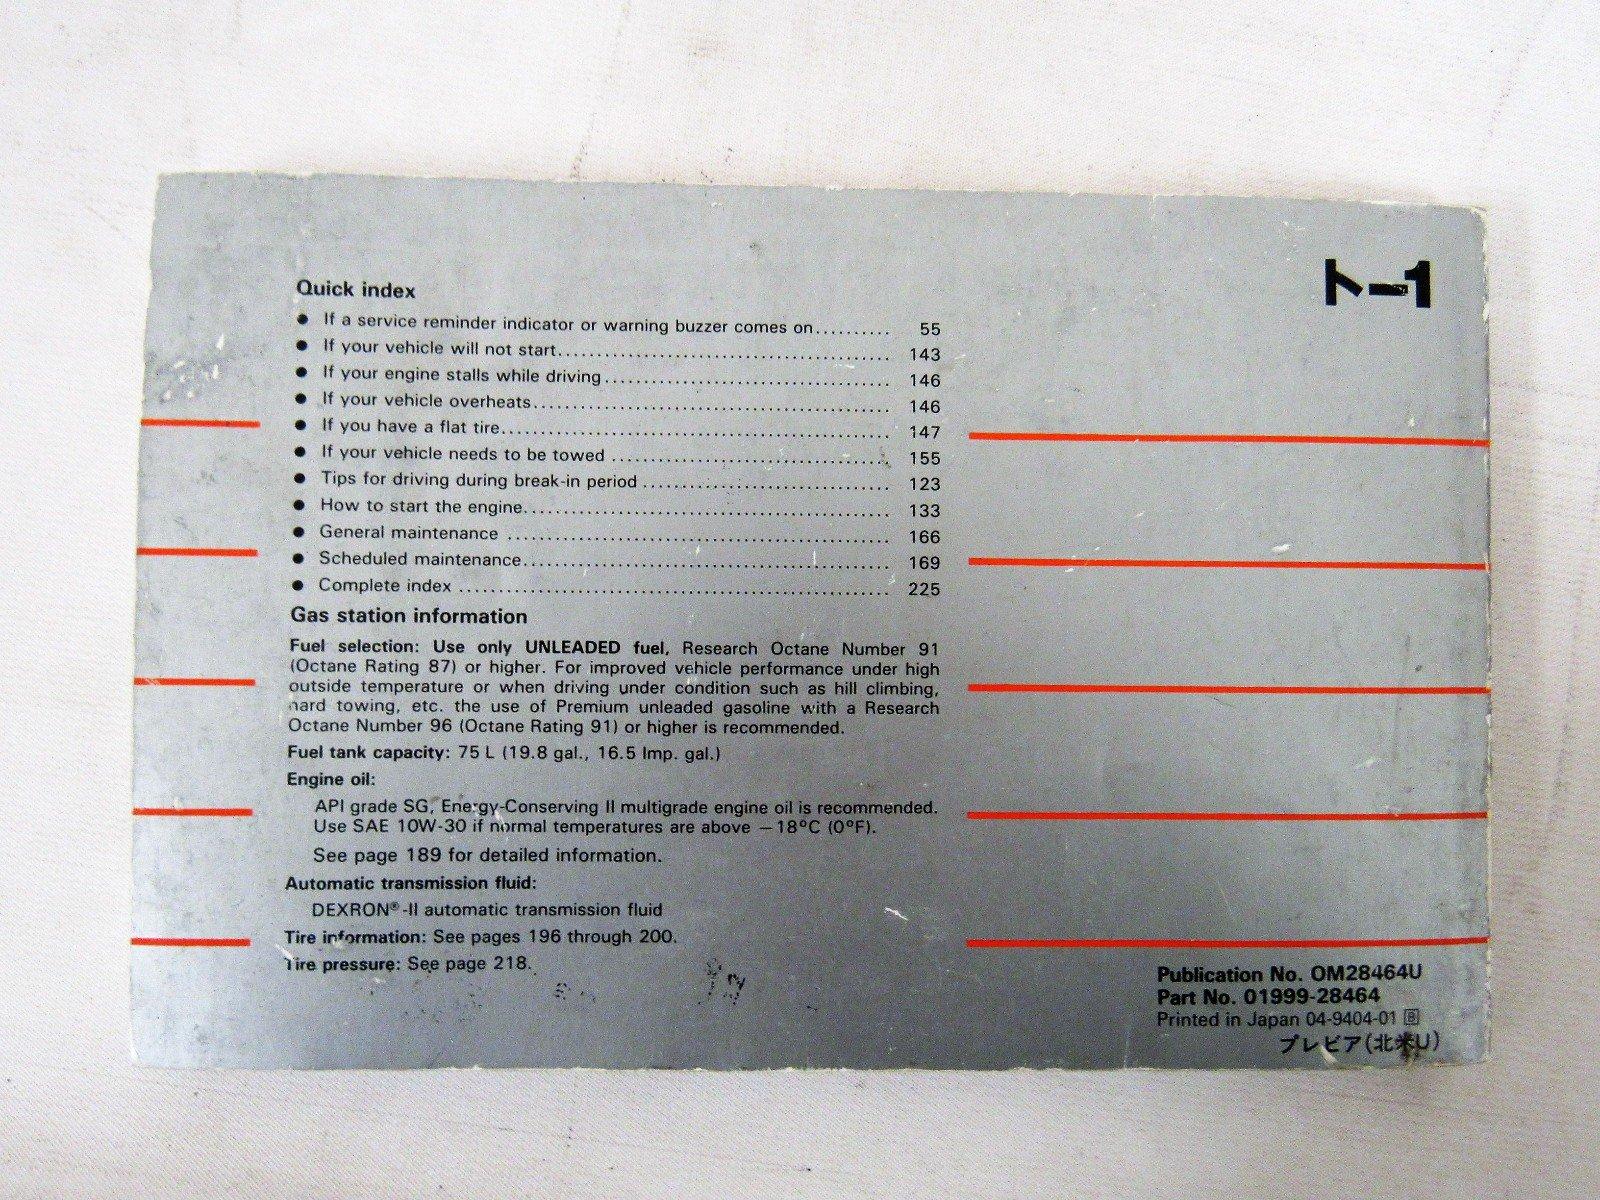 1993 toyota previa owners manual online user manual u2022 rh pandadigital co 1992 Toyota Previa Gas Mileage 1992 Toyota Previa Interior